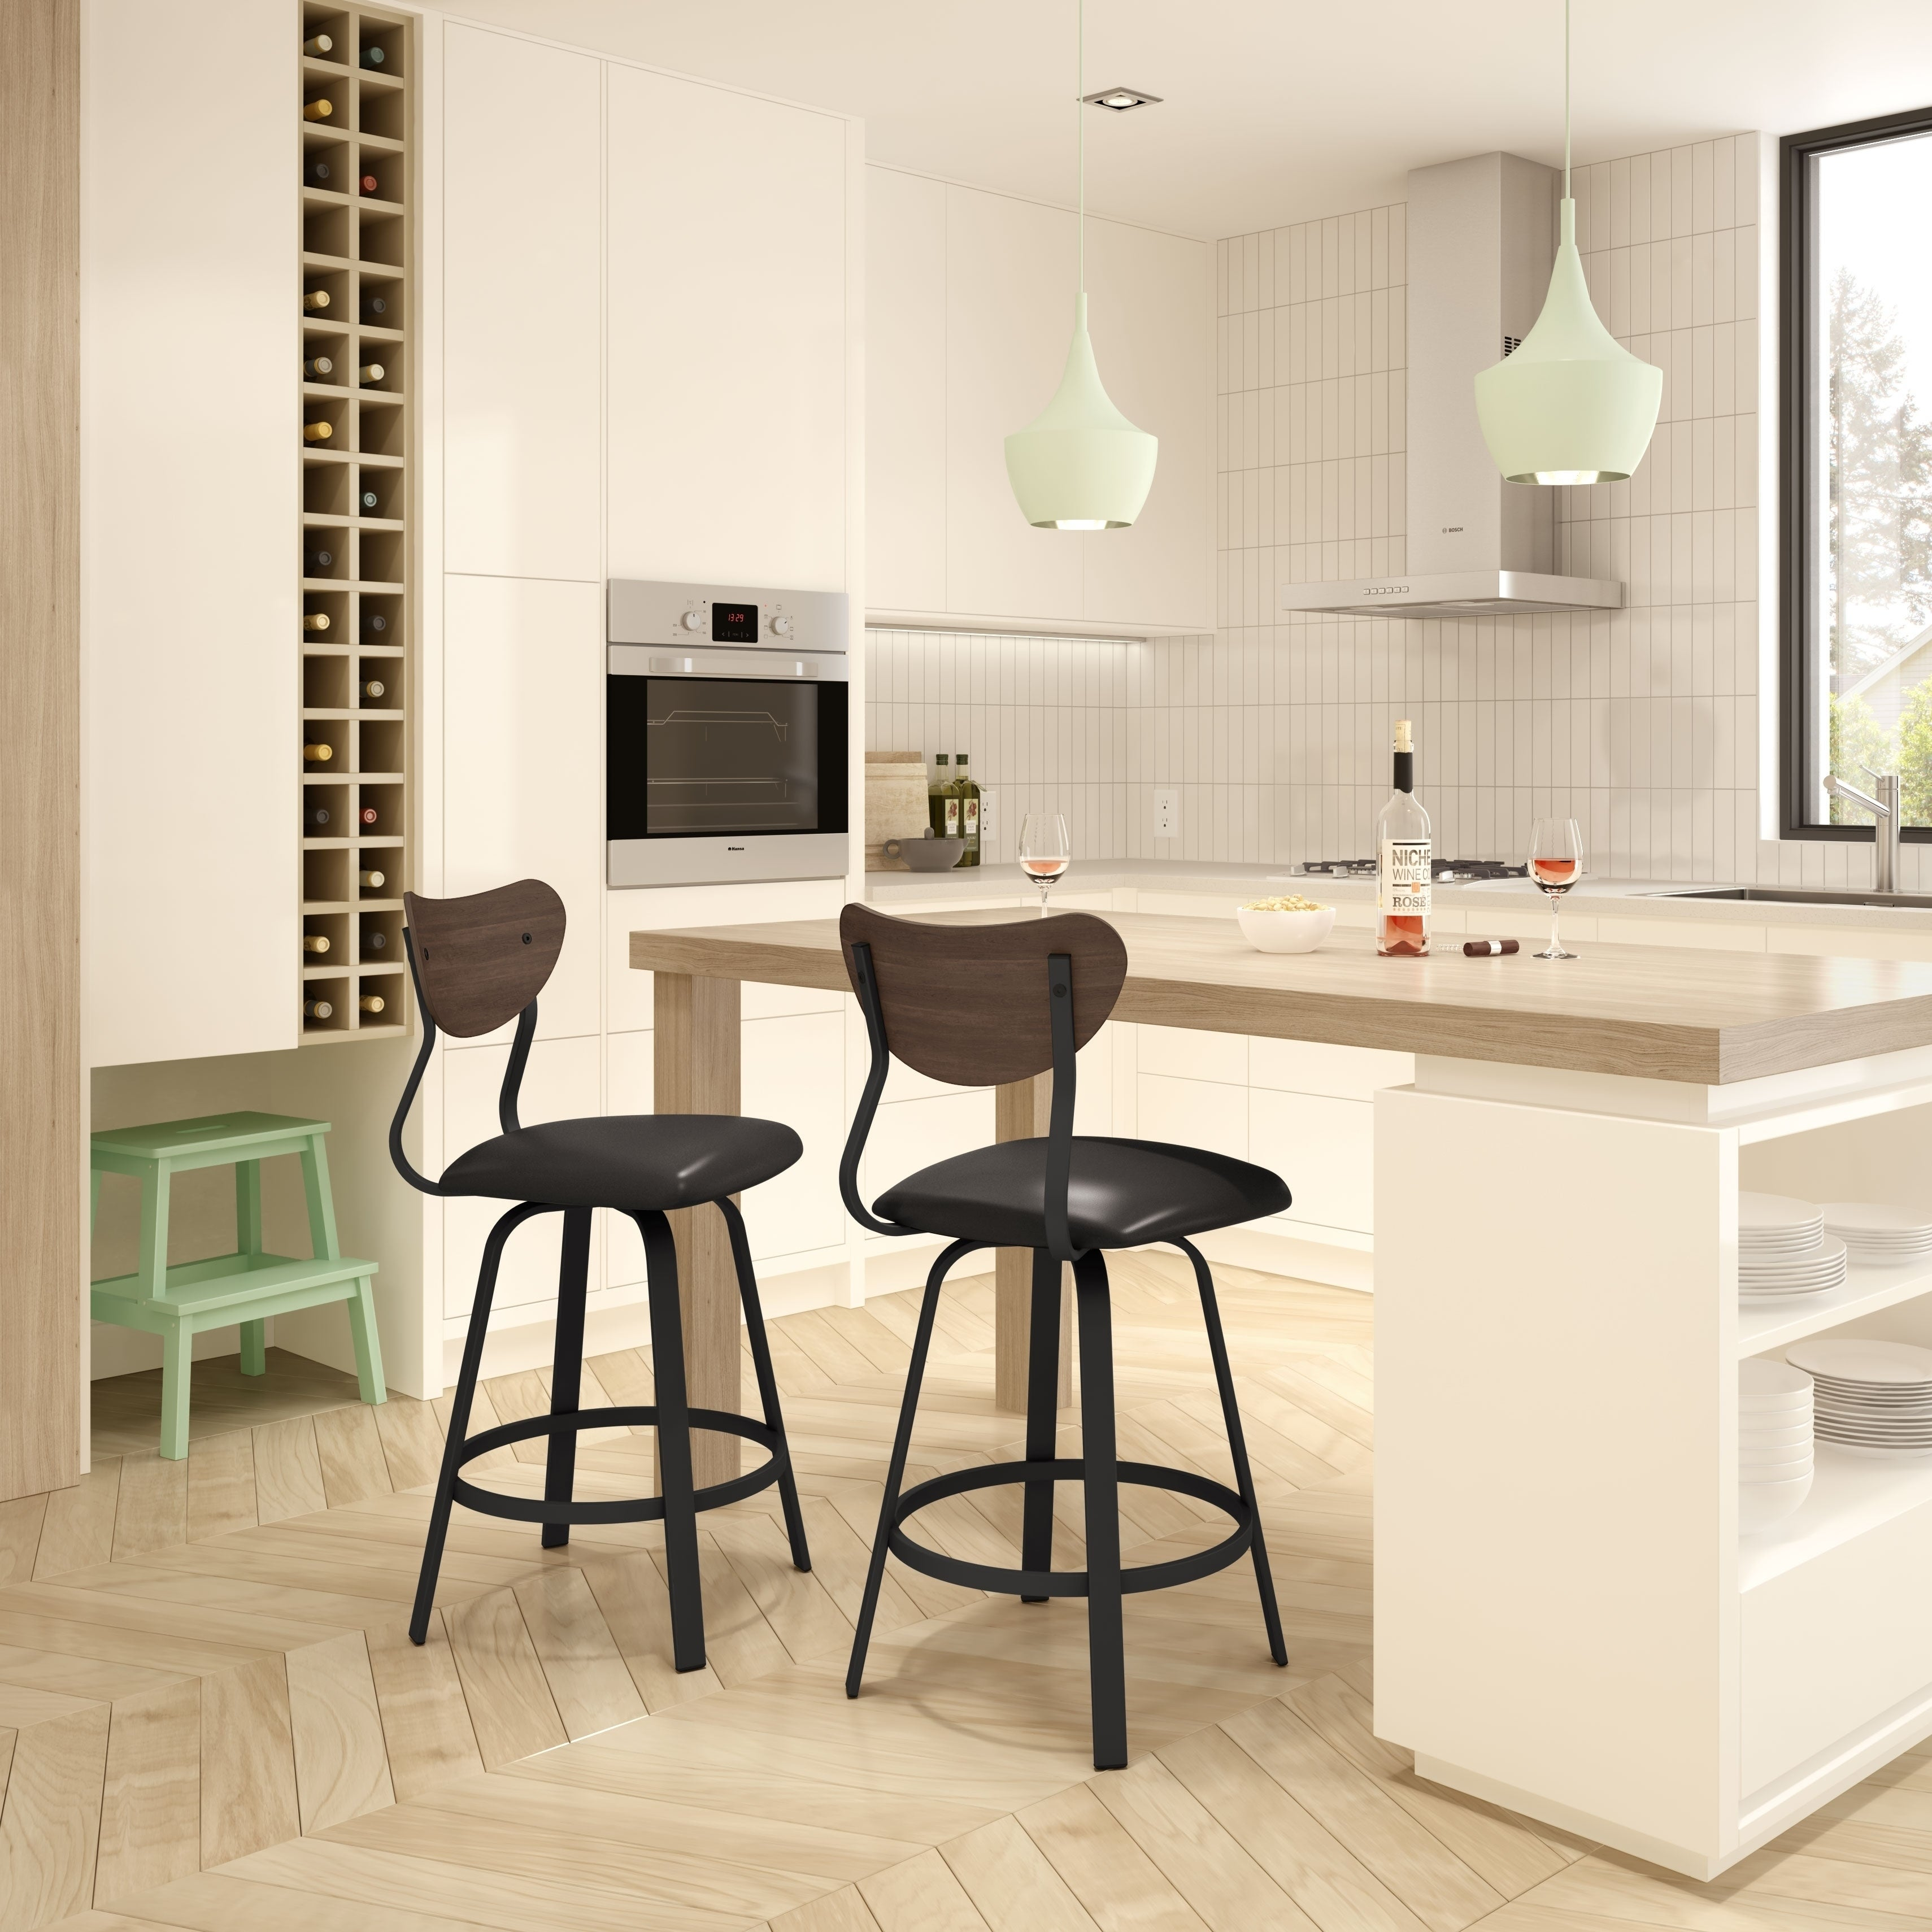 Magnificent Carbon Loft Simpson Armless Swivel Metal Stool Camellatalisay Diy Chair Ideas Camellatalisaycom